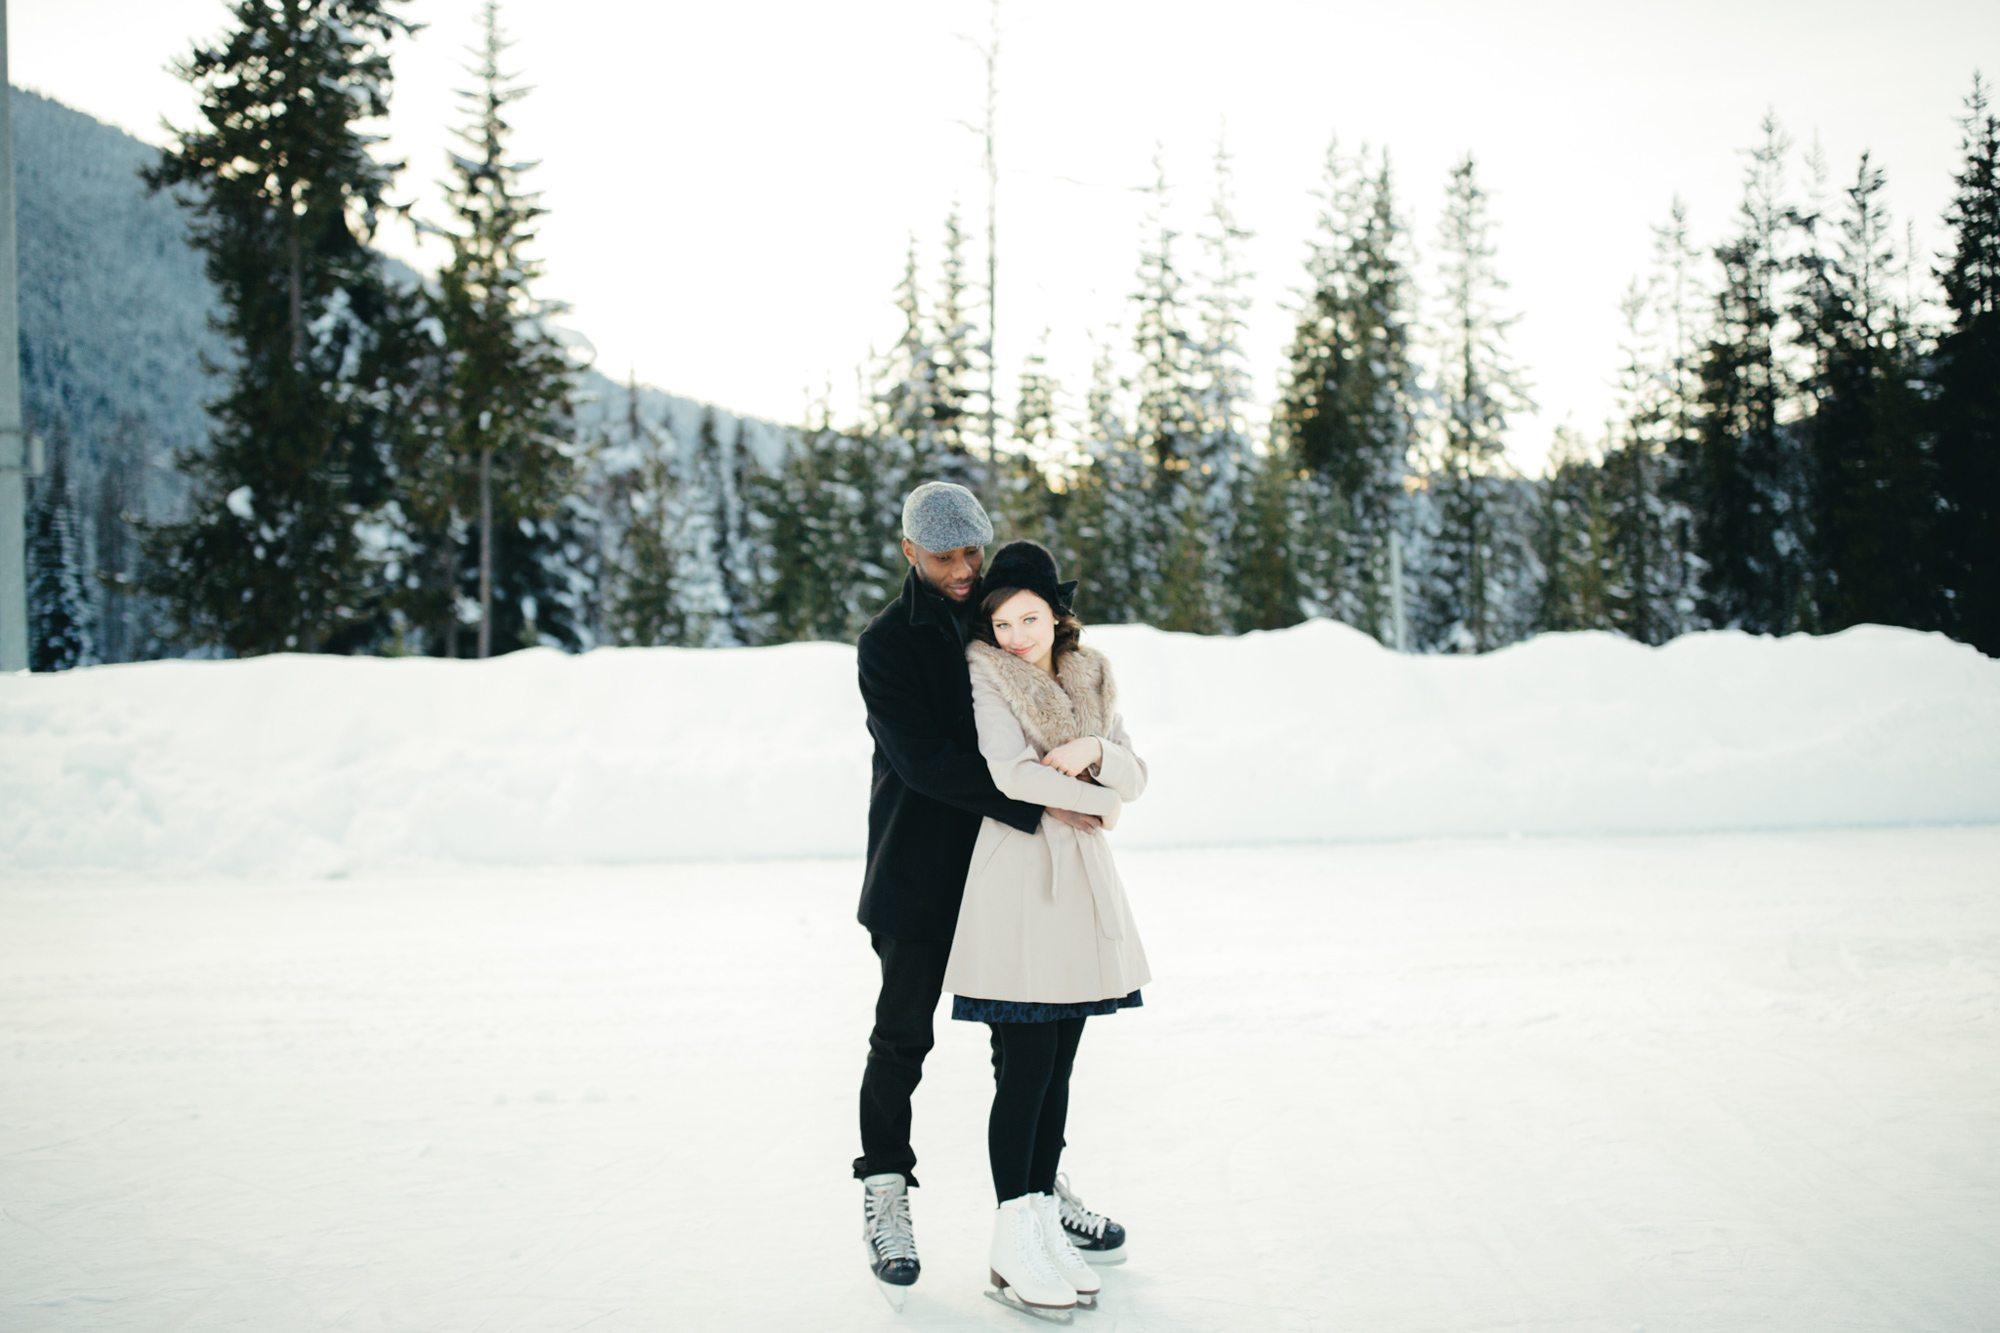 067-adventure-engagement-photographer